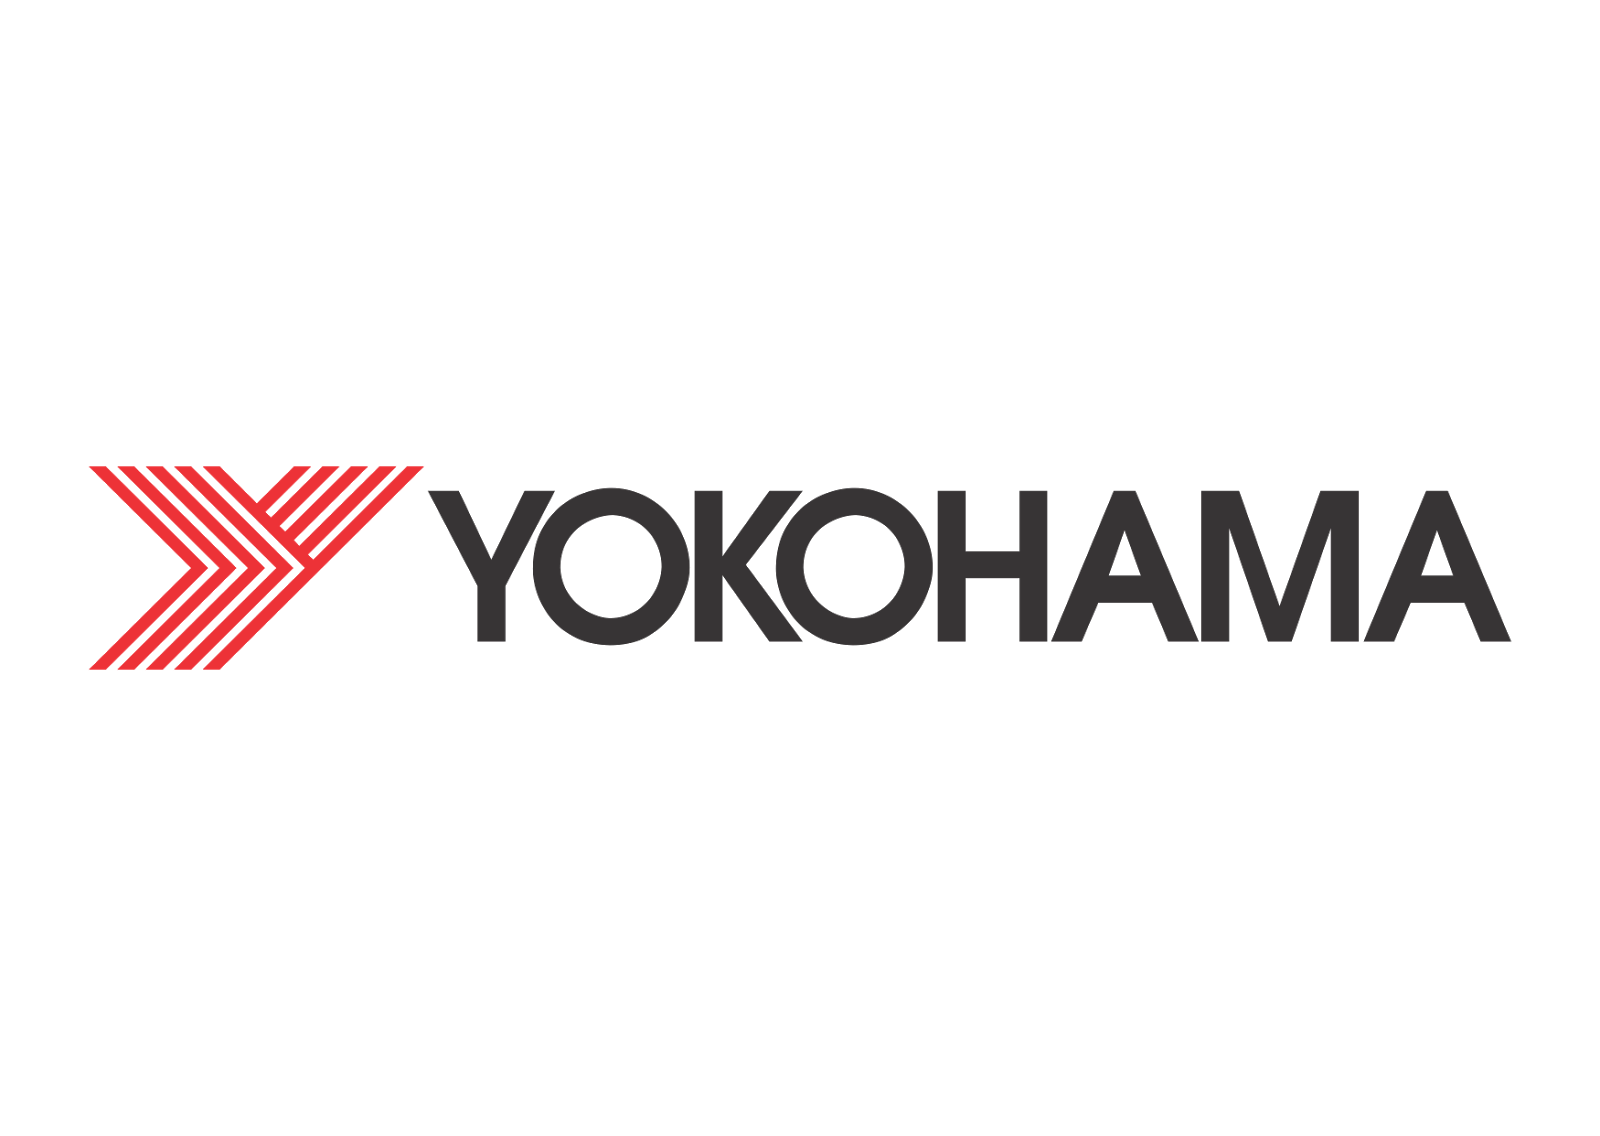 Yokohama Logo Vector (Tire manufacturing company)~ Format Cdr, Ai ...